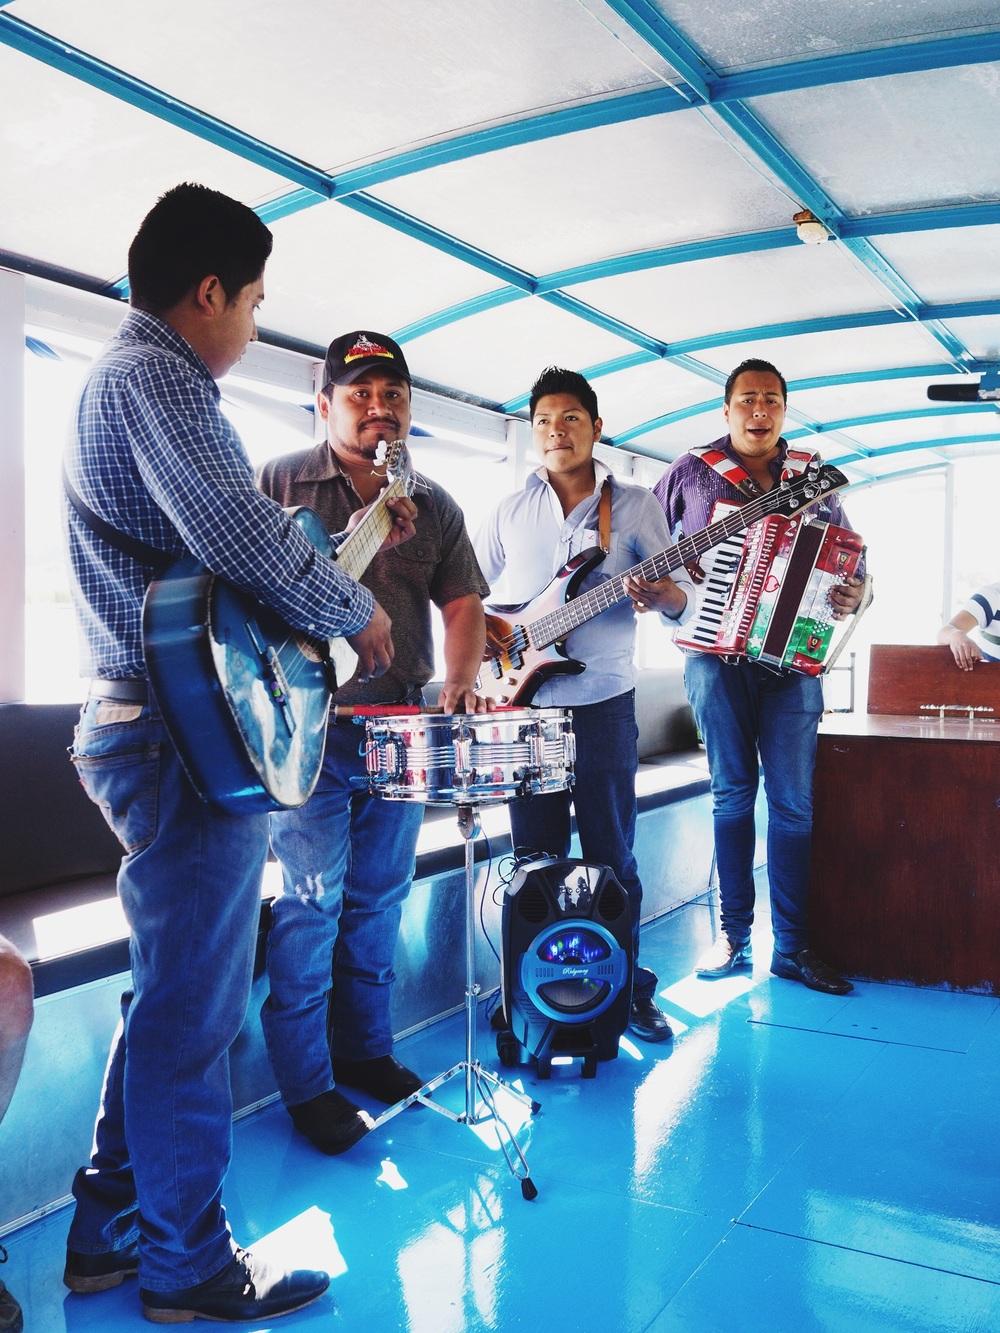 Serenaded on the boat to Isla de Janitzio